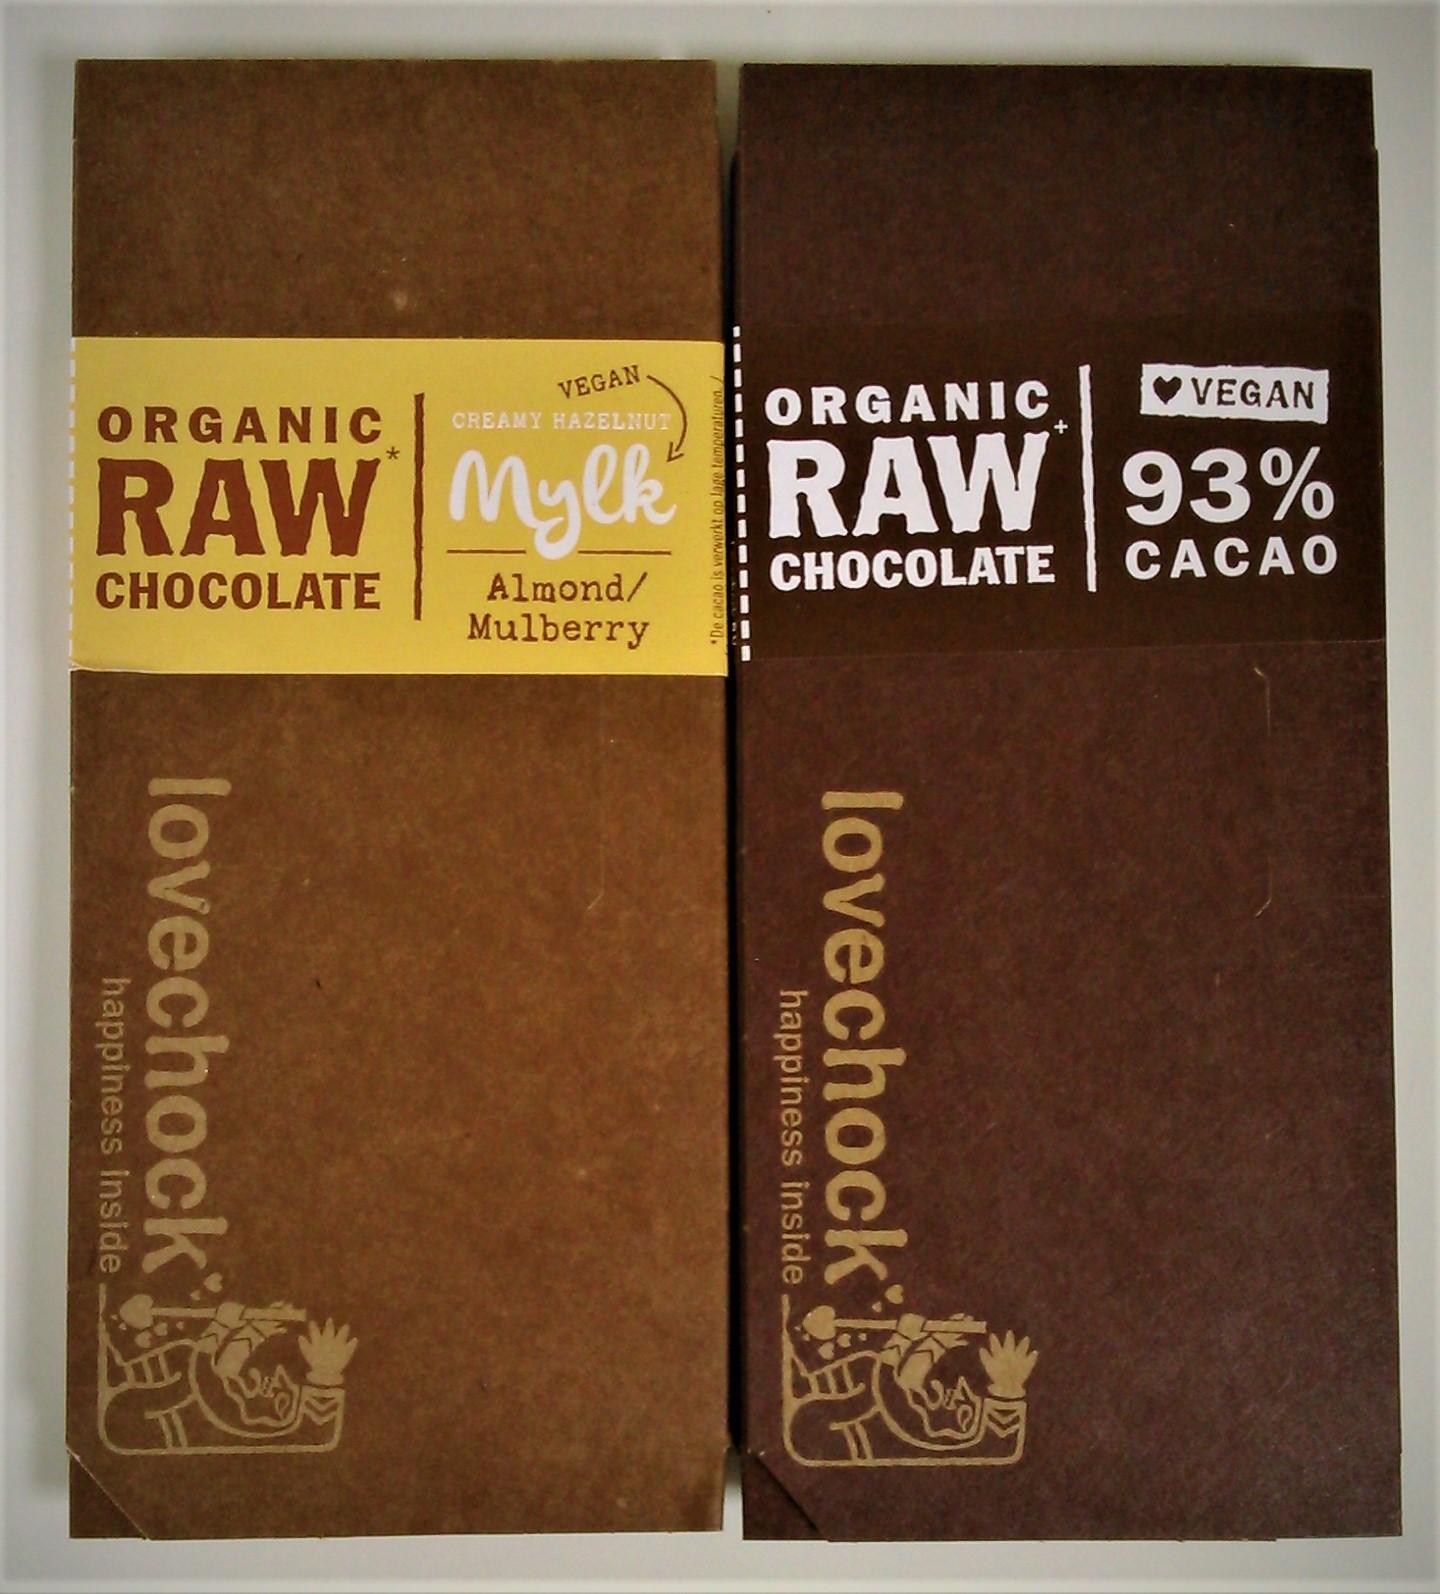 Lovechock Organic Raw Chocolate